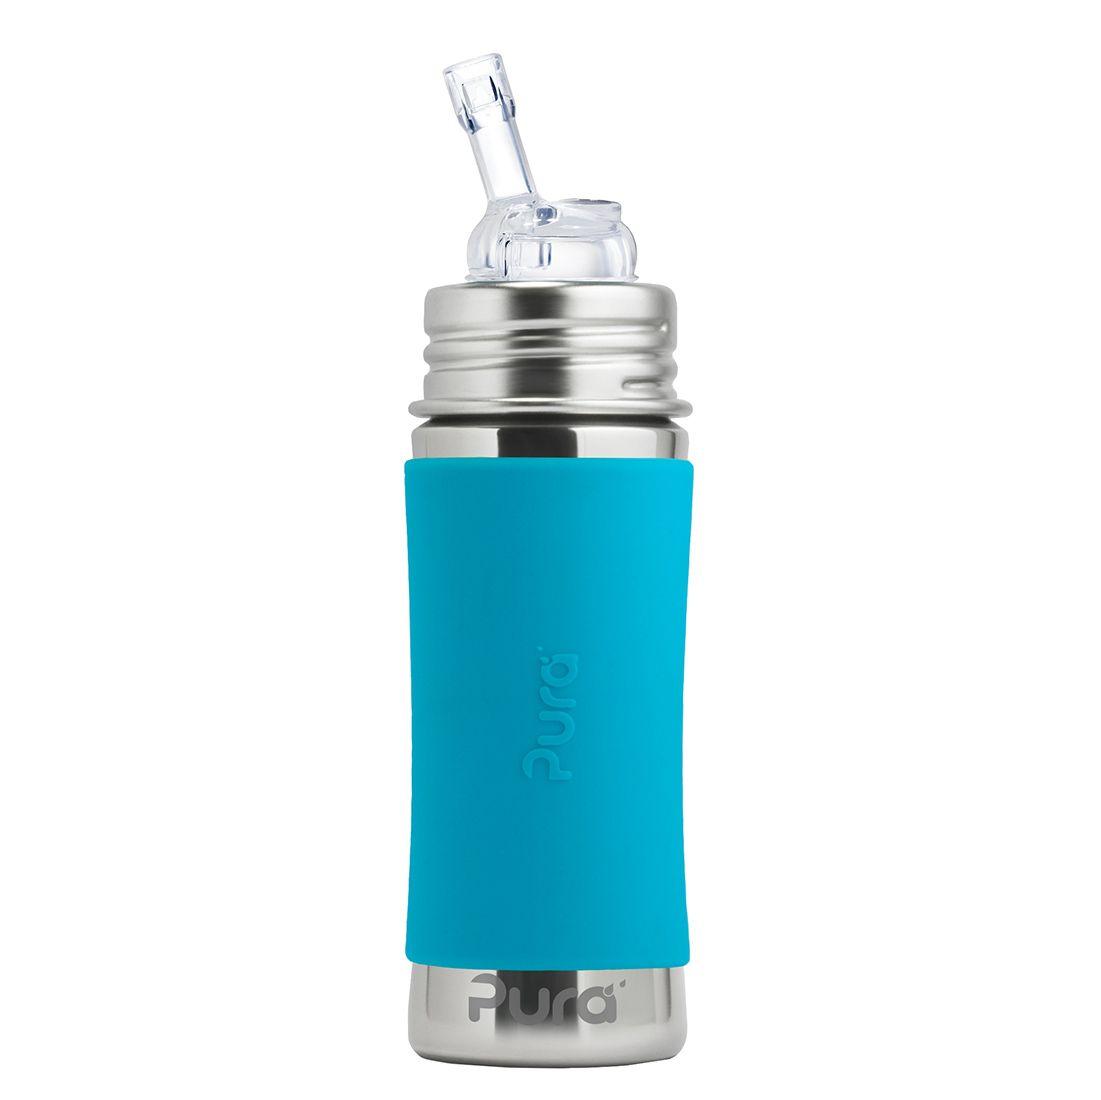 Pura® nerezová láhev s brčkem 325 ml, AQUA